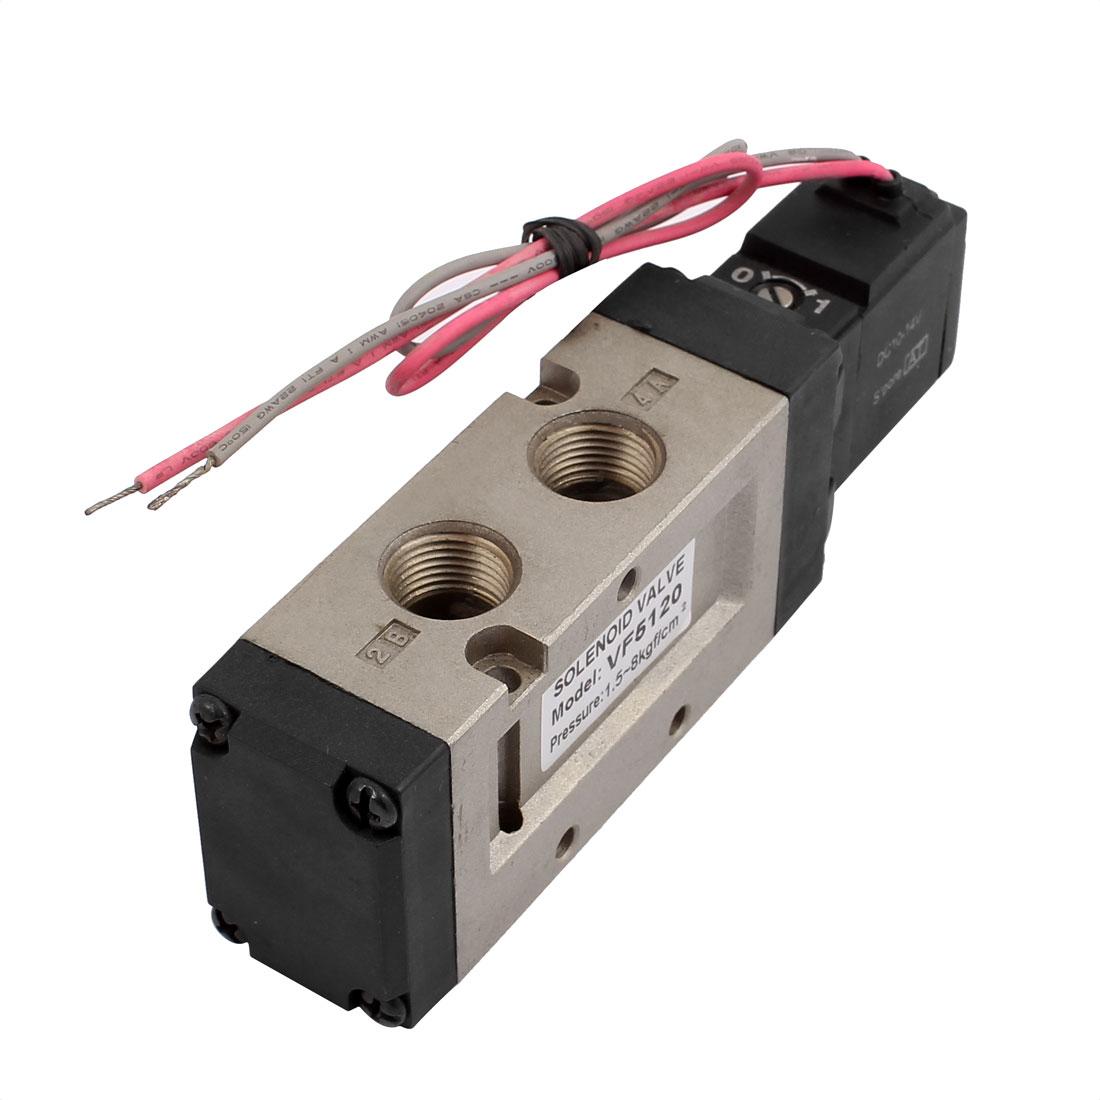 DC 12V 2 Position 5 Way Pneumatic Electromagnetic Solenoid Valve VF5120-6GB